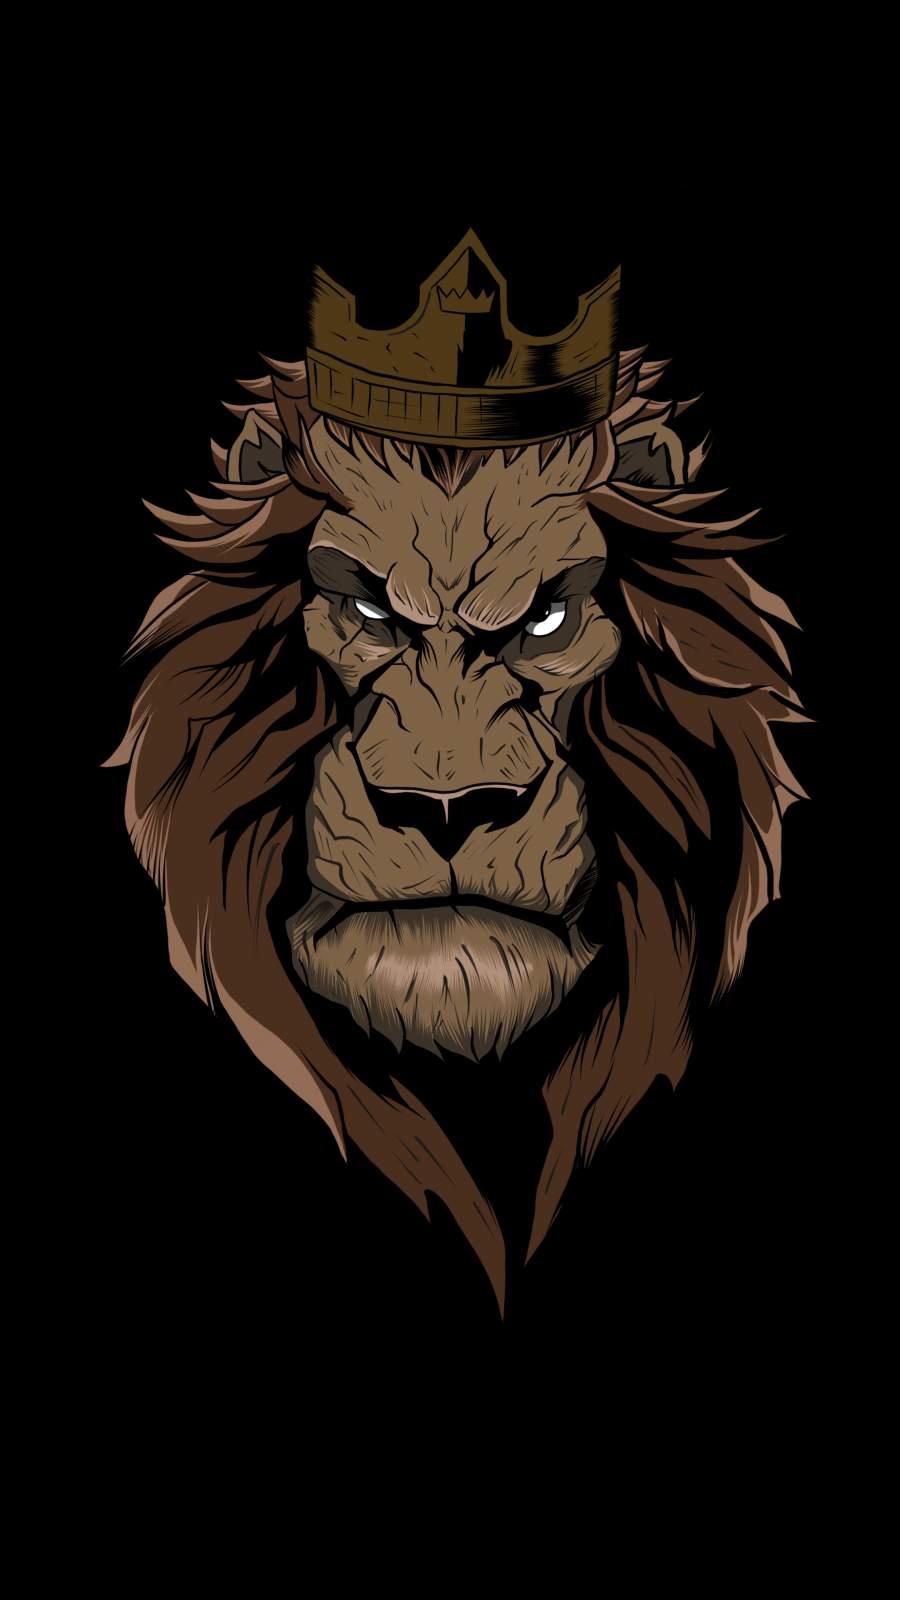 Simba Lion King iPhone Wallpaper